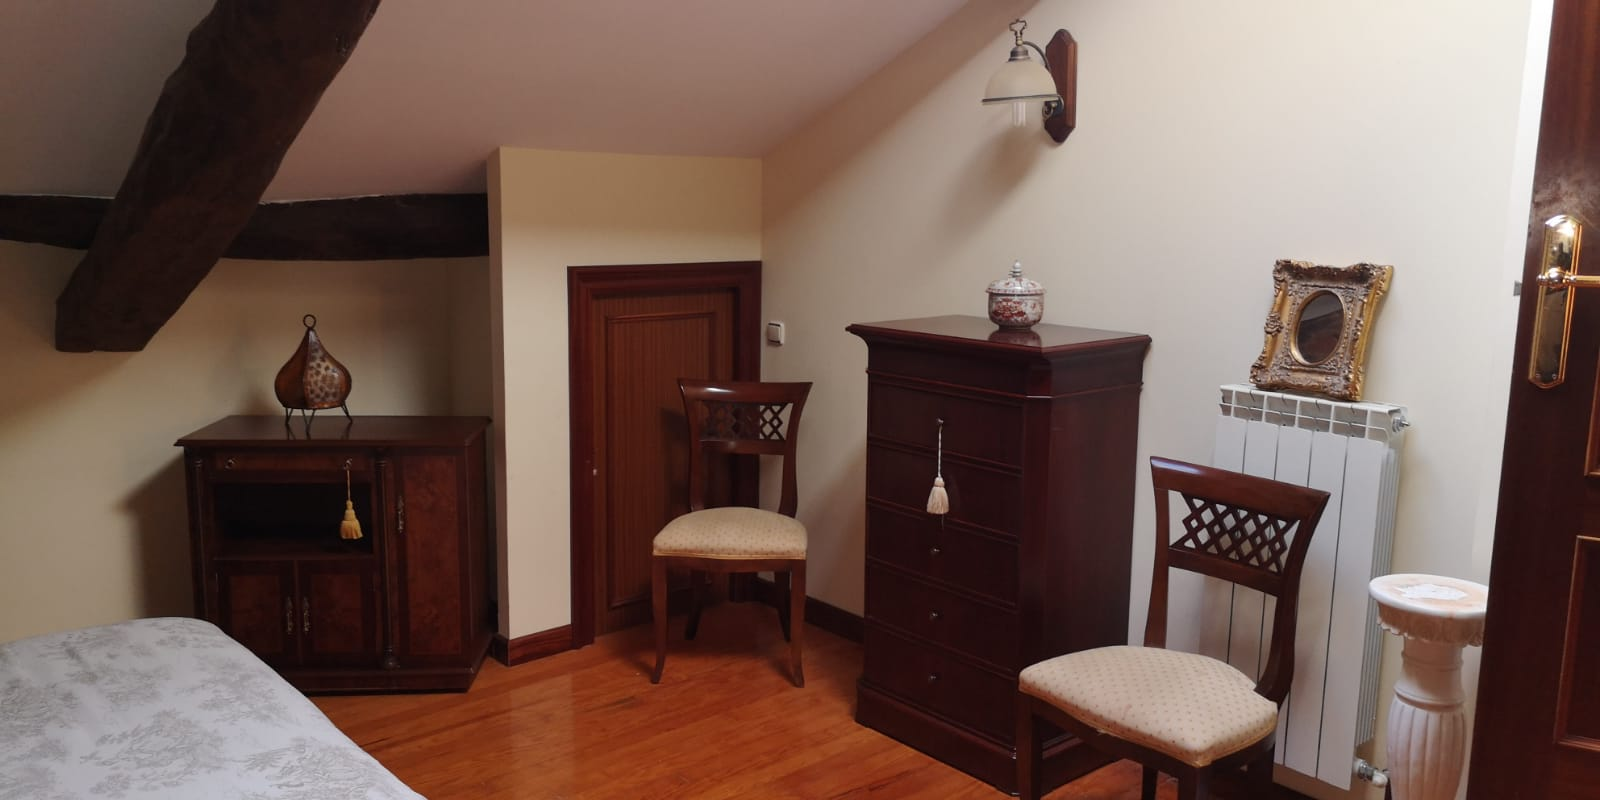 07.Habitacion-Etxauri-Casa-Rural (5)